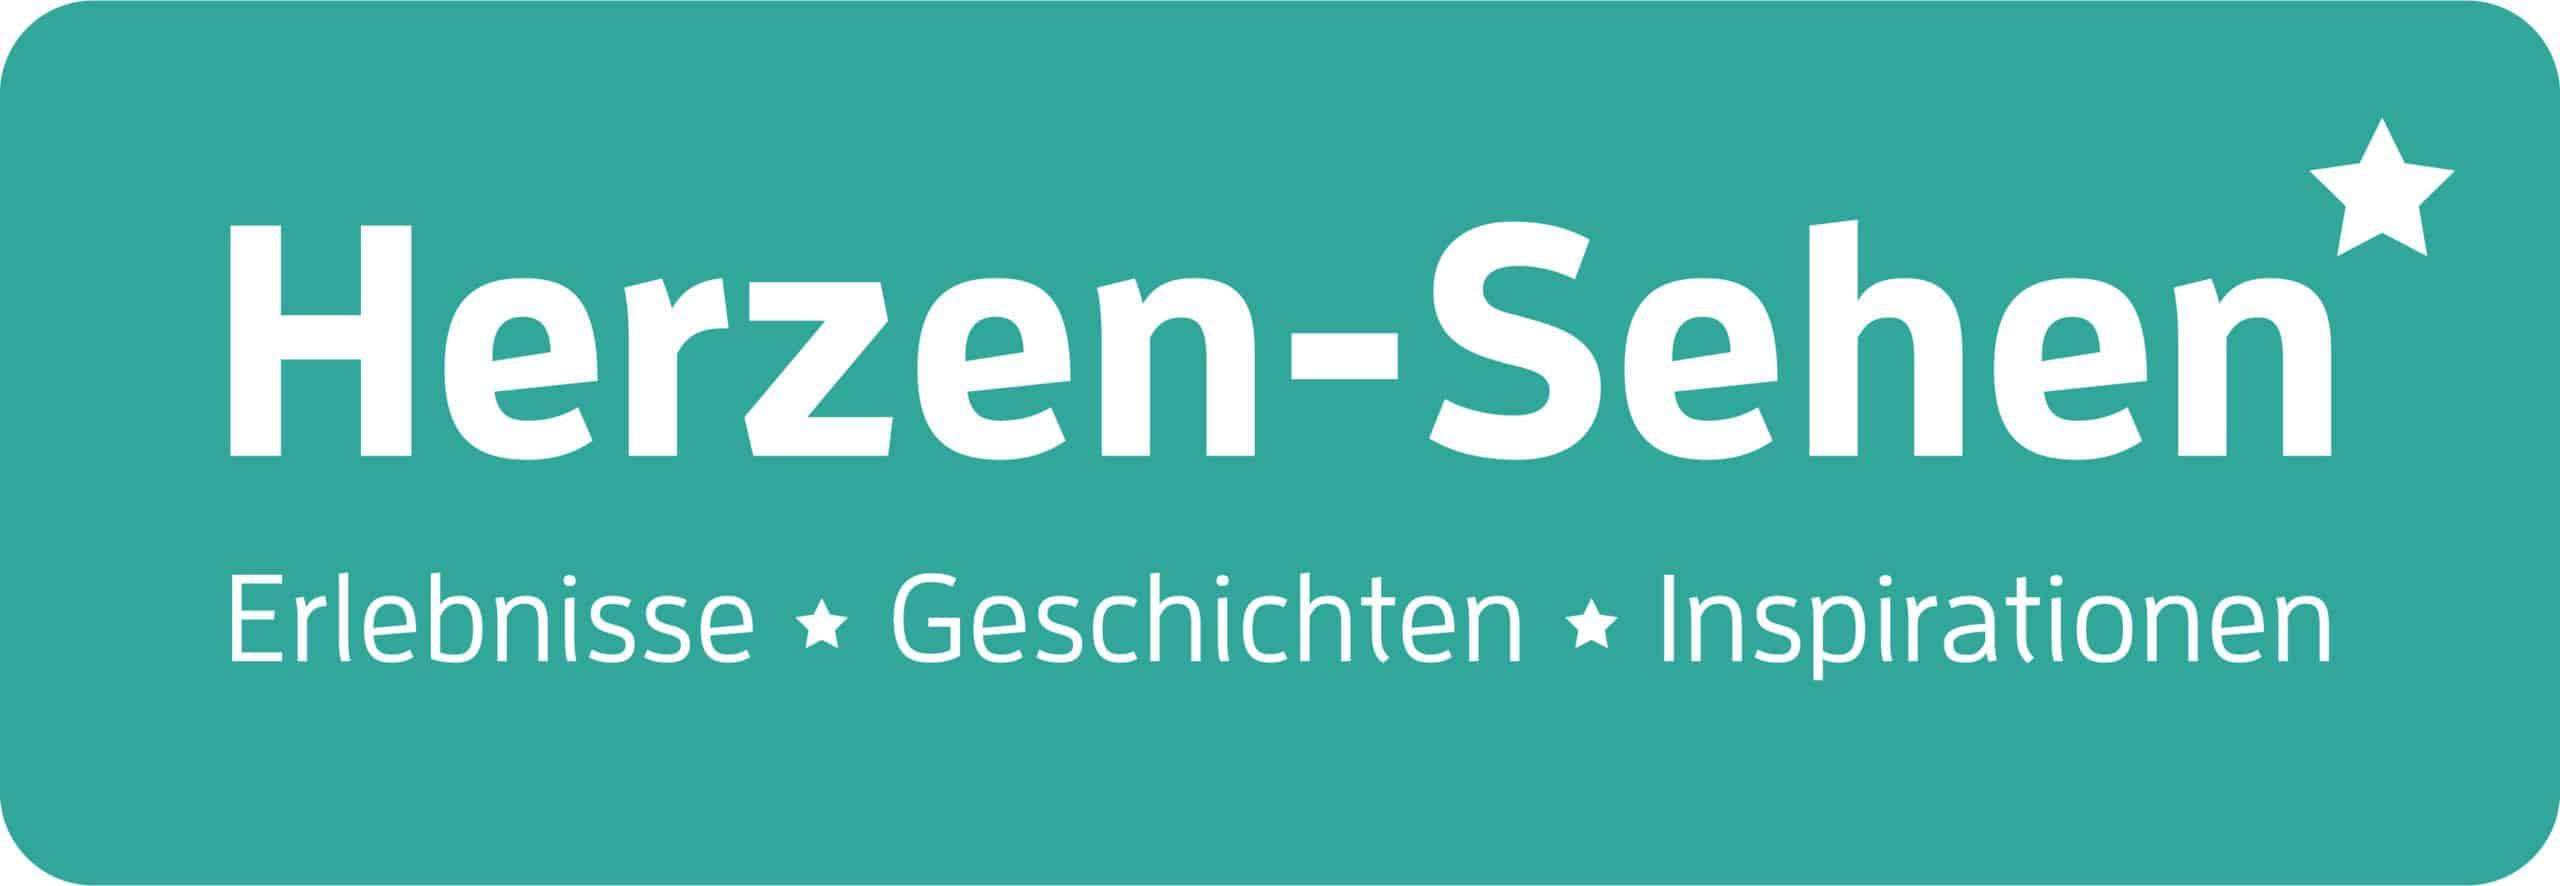 Logo Herzen-Sehen